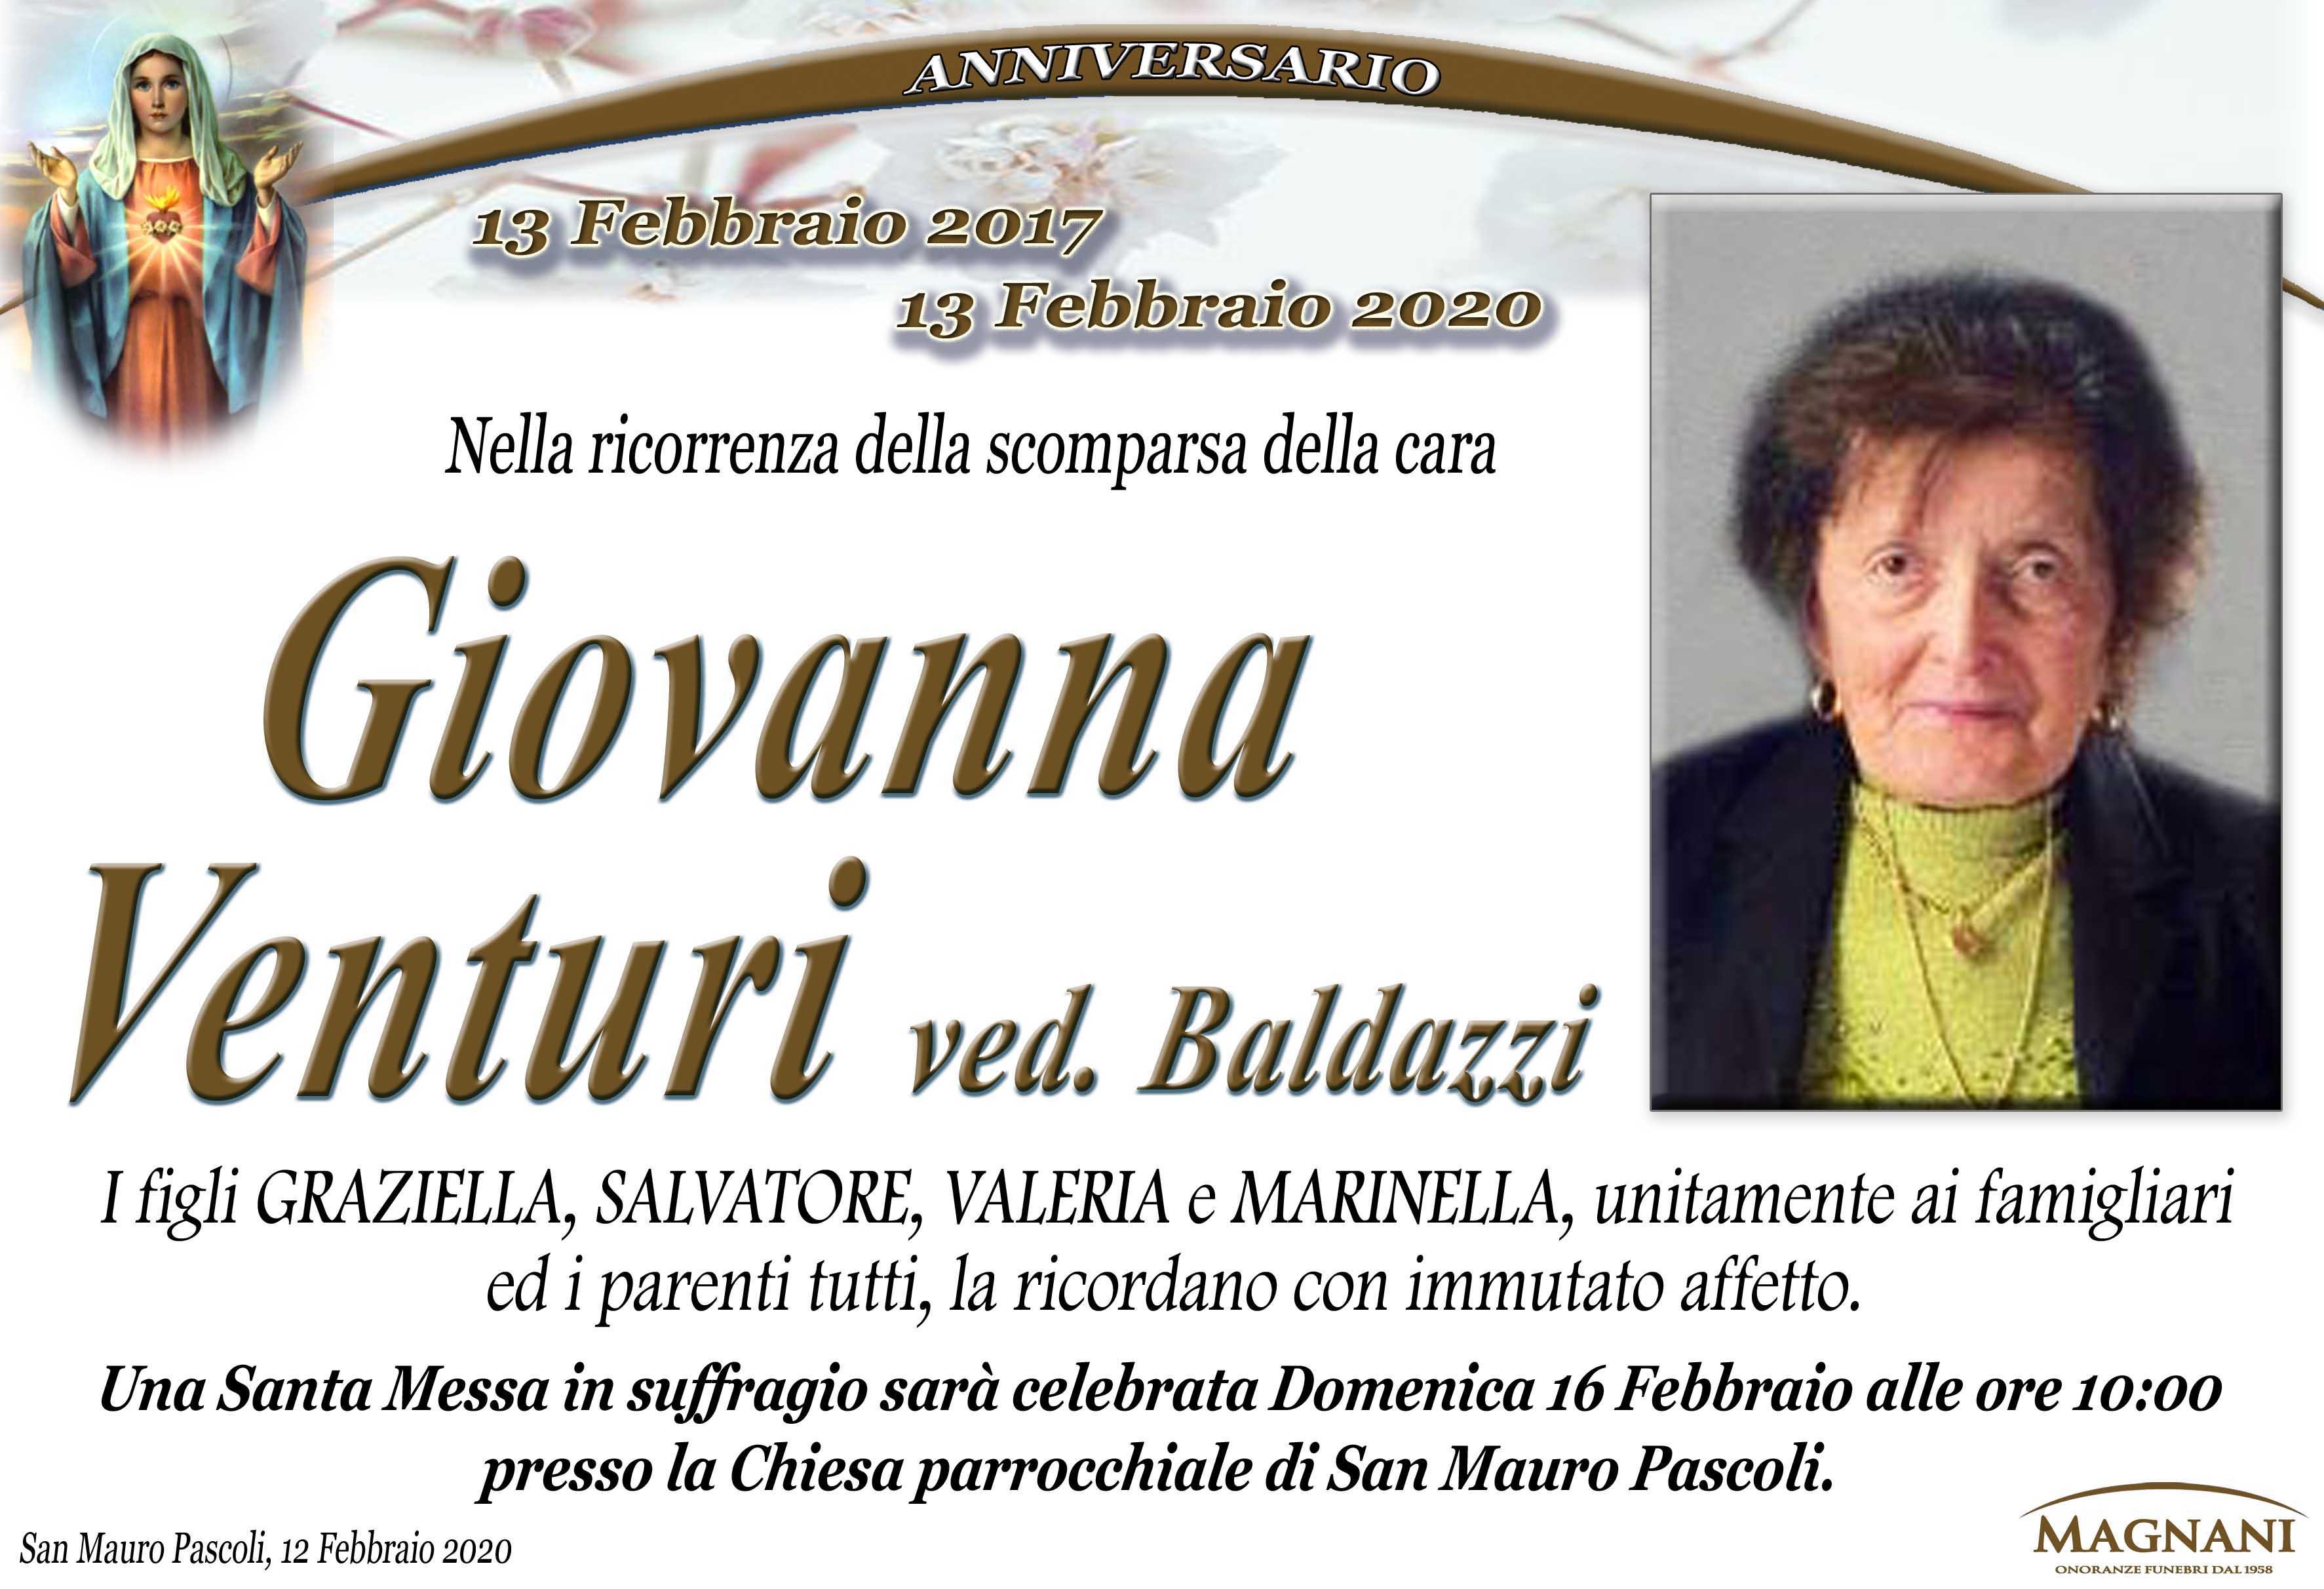 Giovanna Venturi